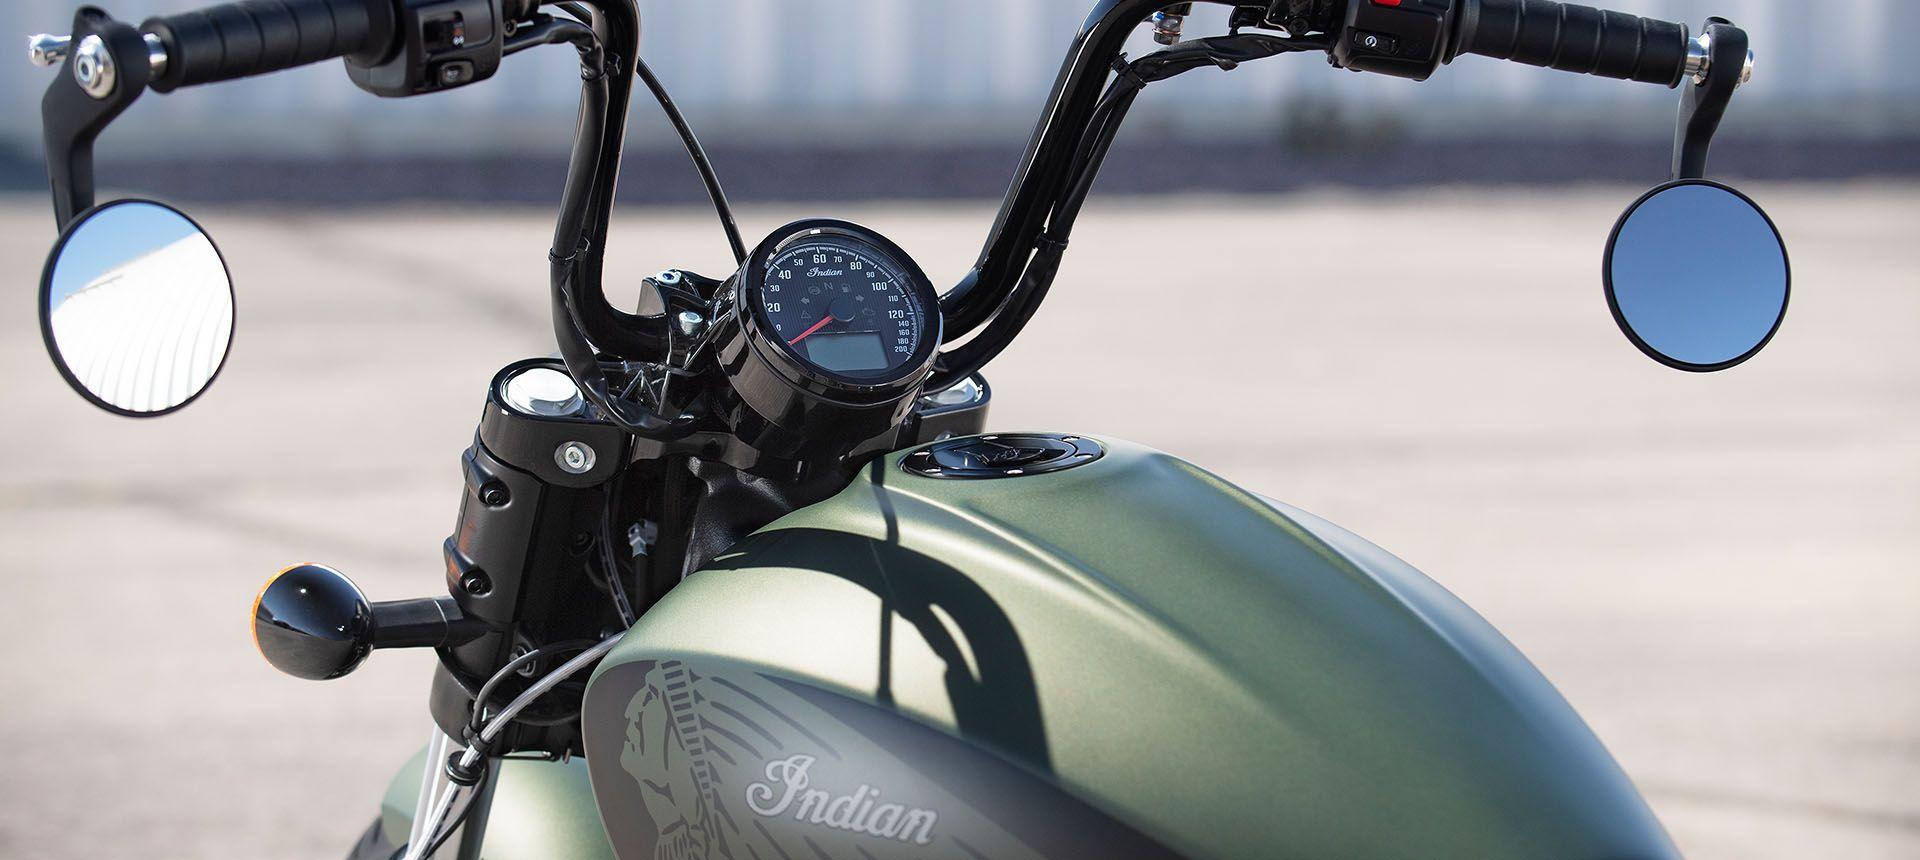 Мотоцикл Indian Scout Bobber Twenty Burnished Metallic 2020 - 4